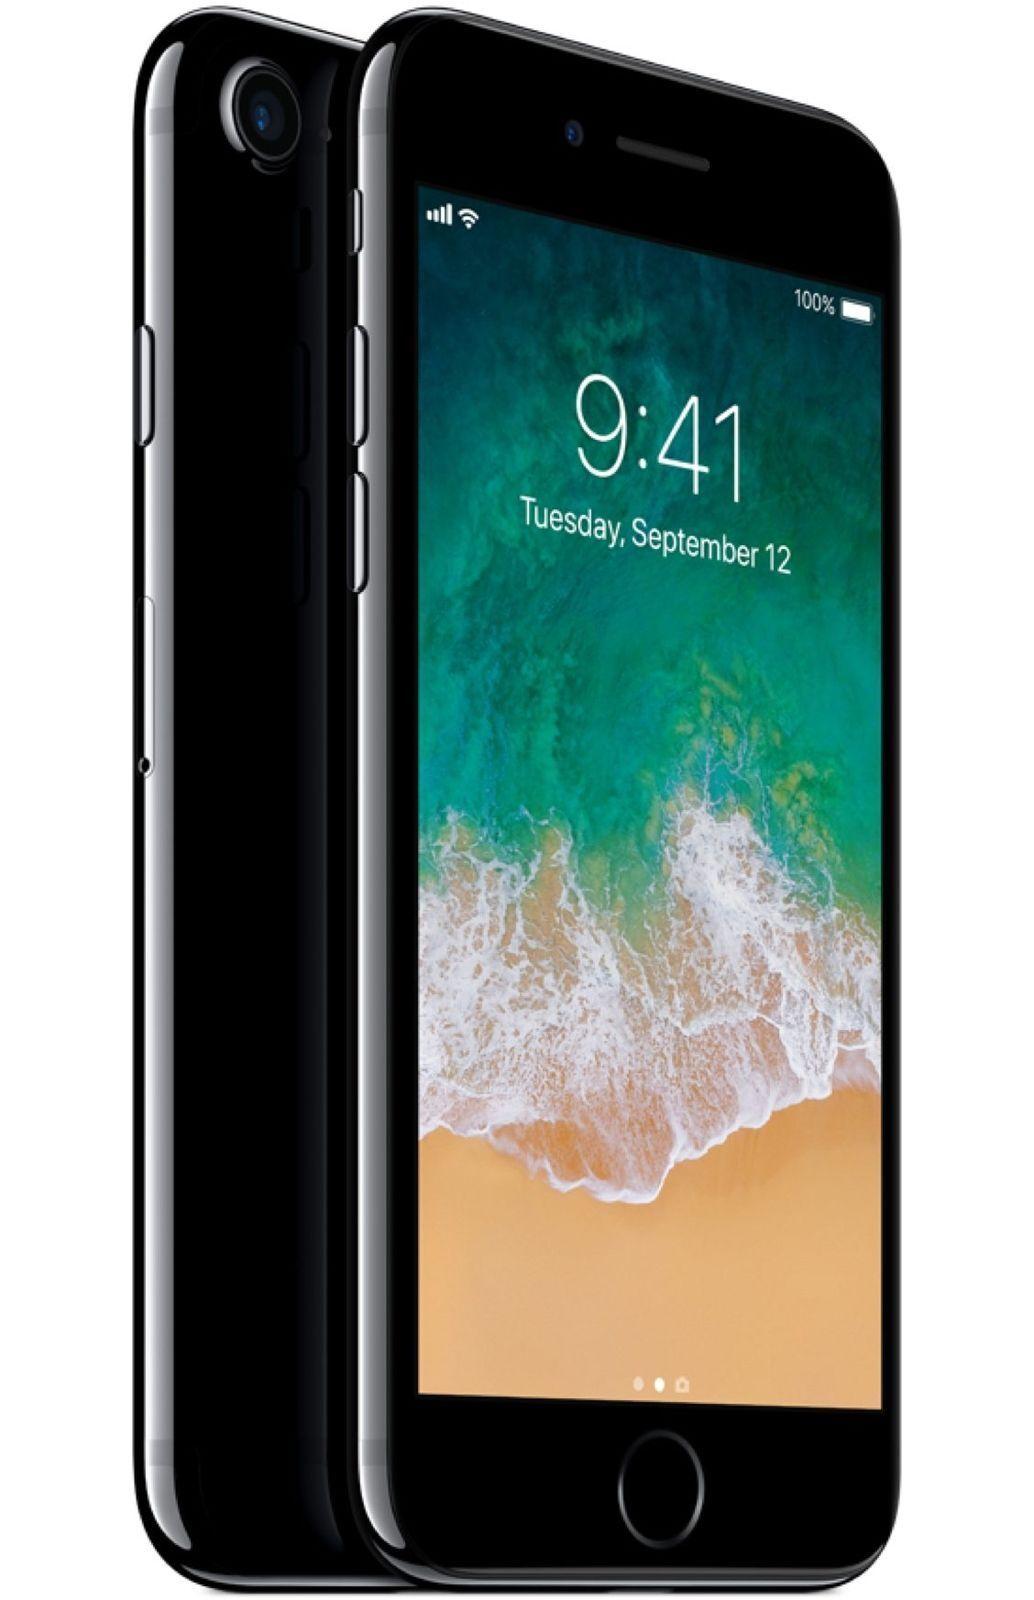 Apple iPhone 7 - 128GB - Jet Black (GSM Unlocked AT&T / T-Mobile) Smartphone